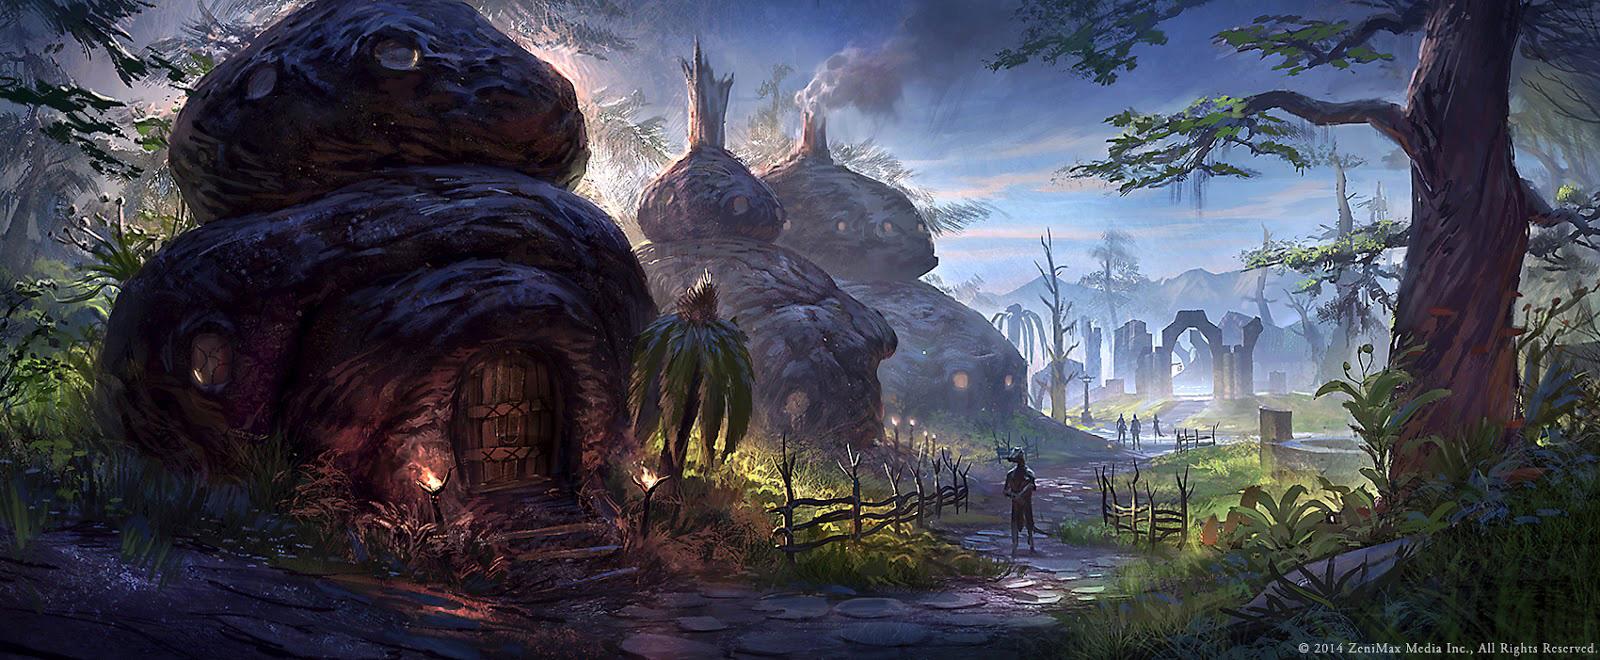 The Elder Scrolls Online Concept Art by Jeremy Fenske | Concept Art